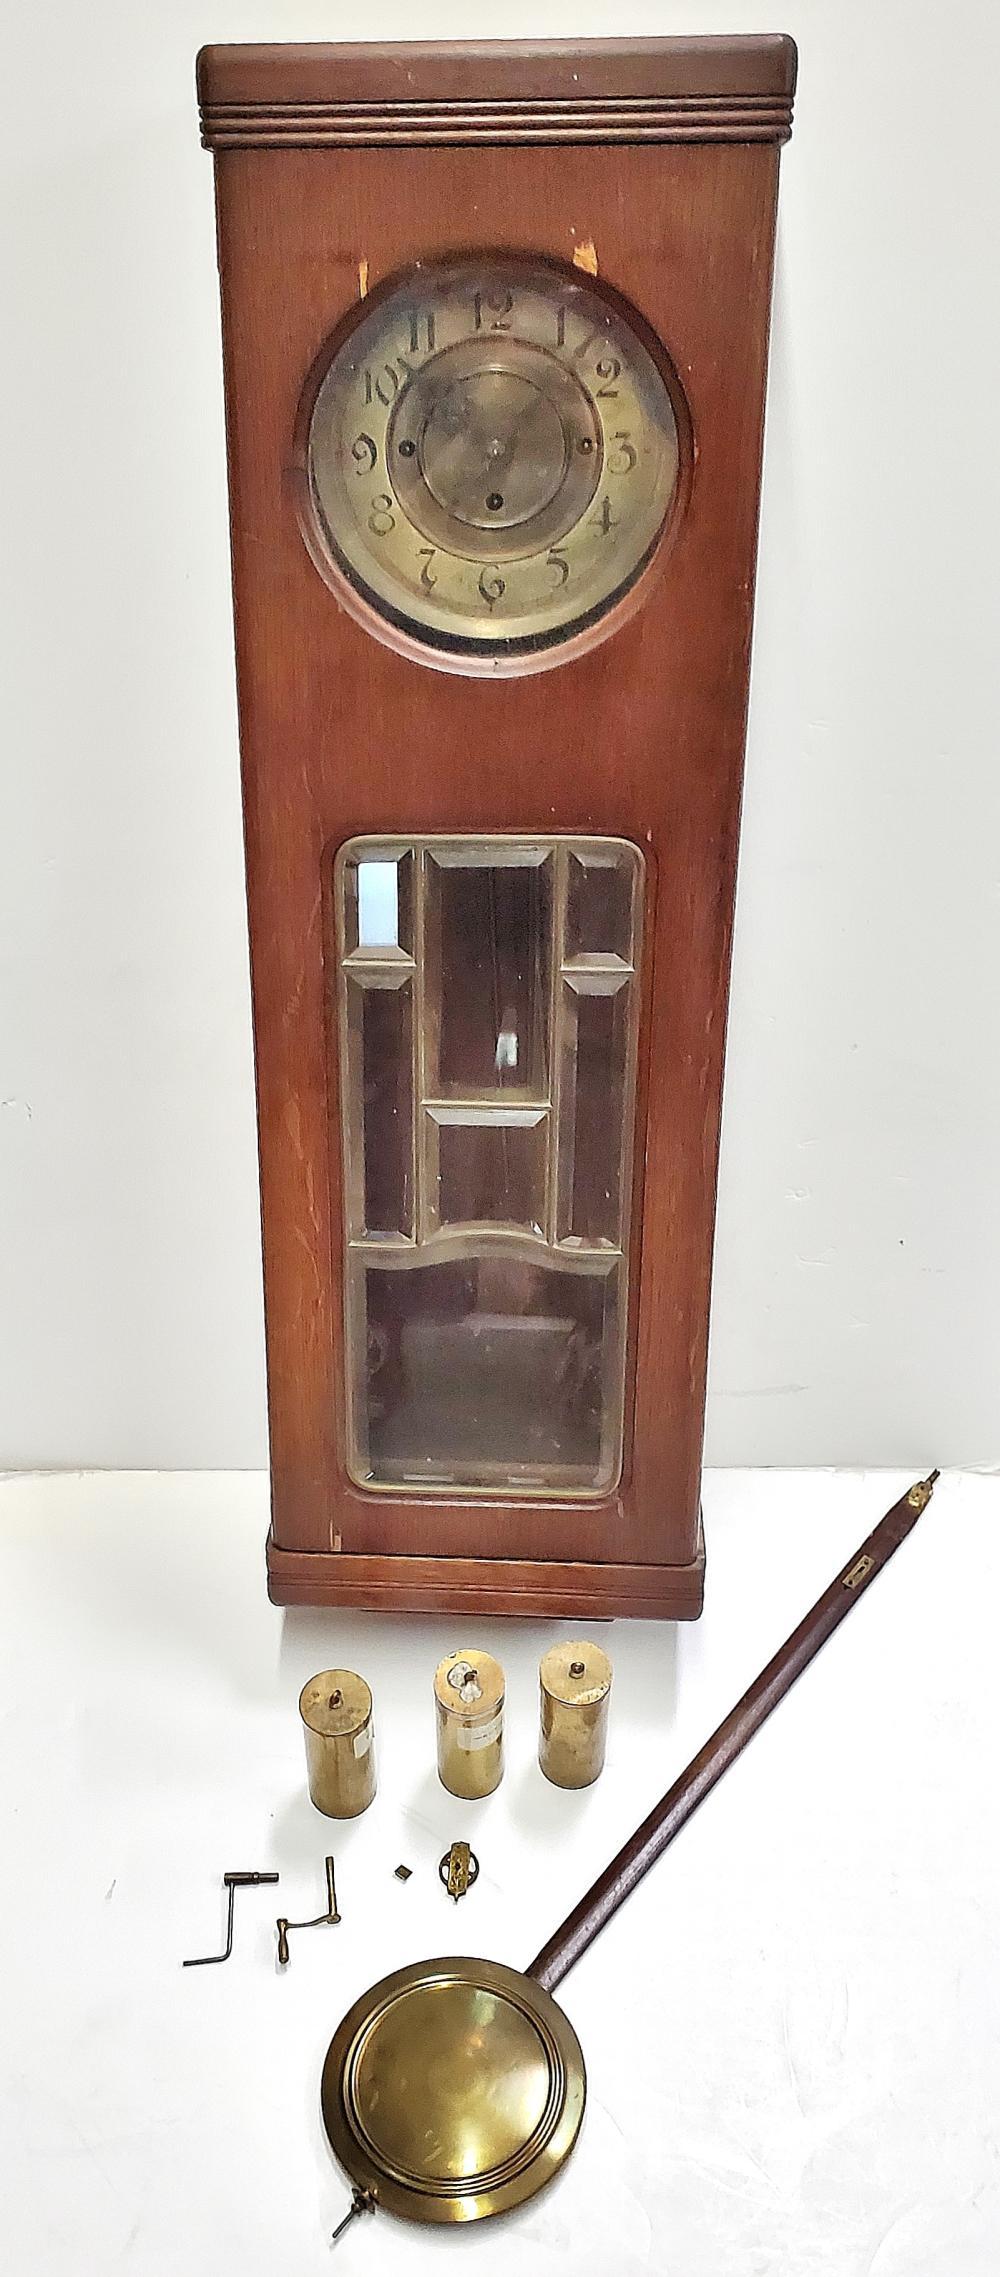 Vintage Long Pendulum Chiming Wall Clock To Repair Restore